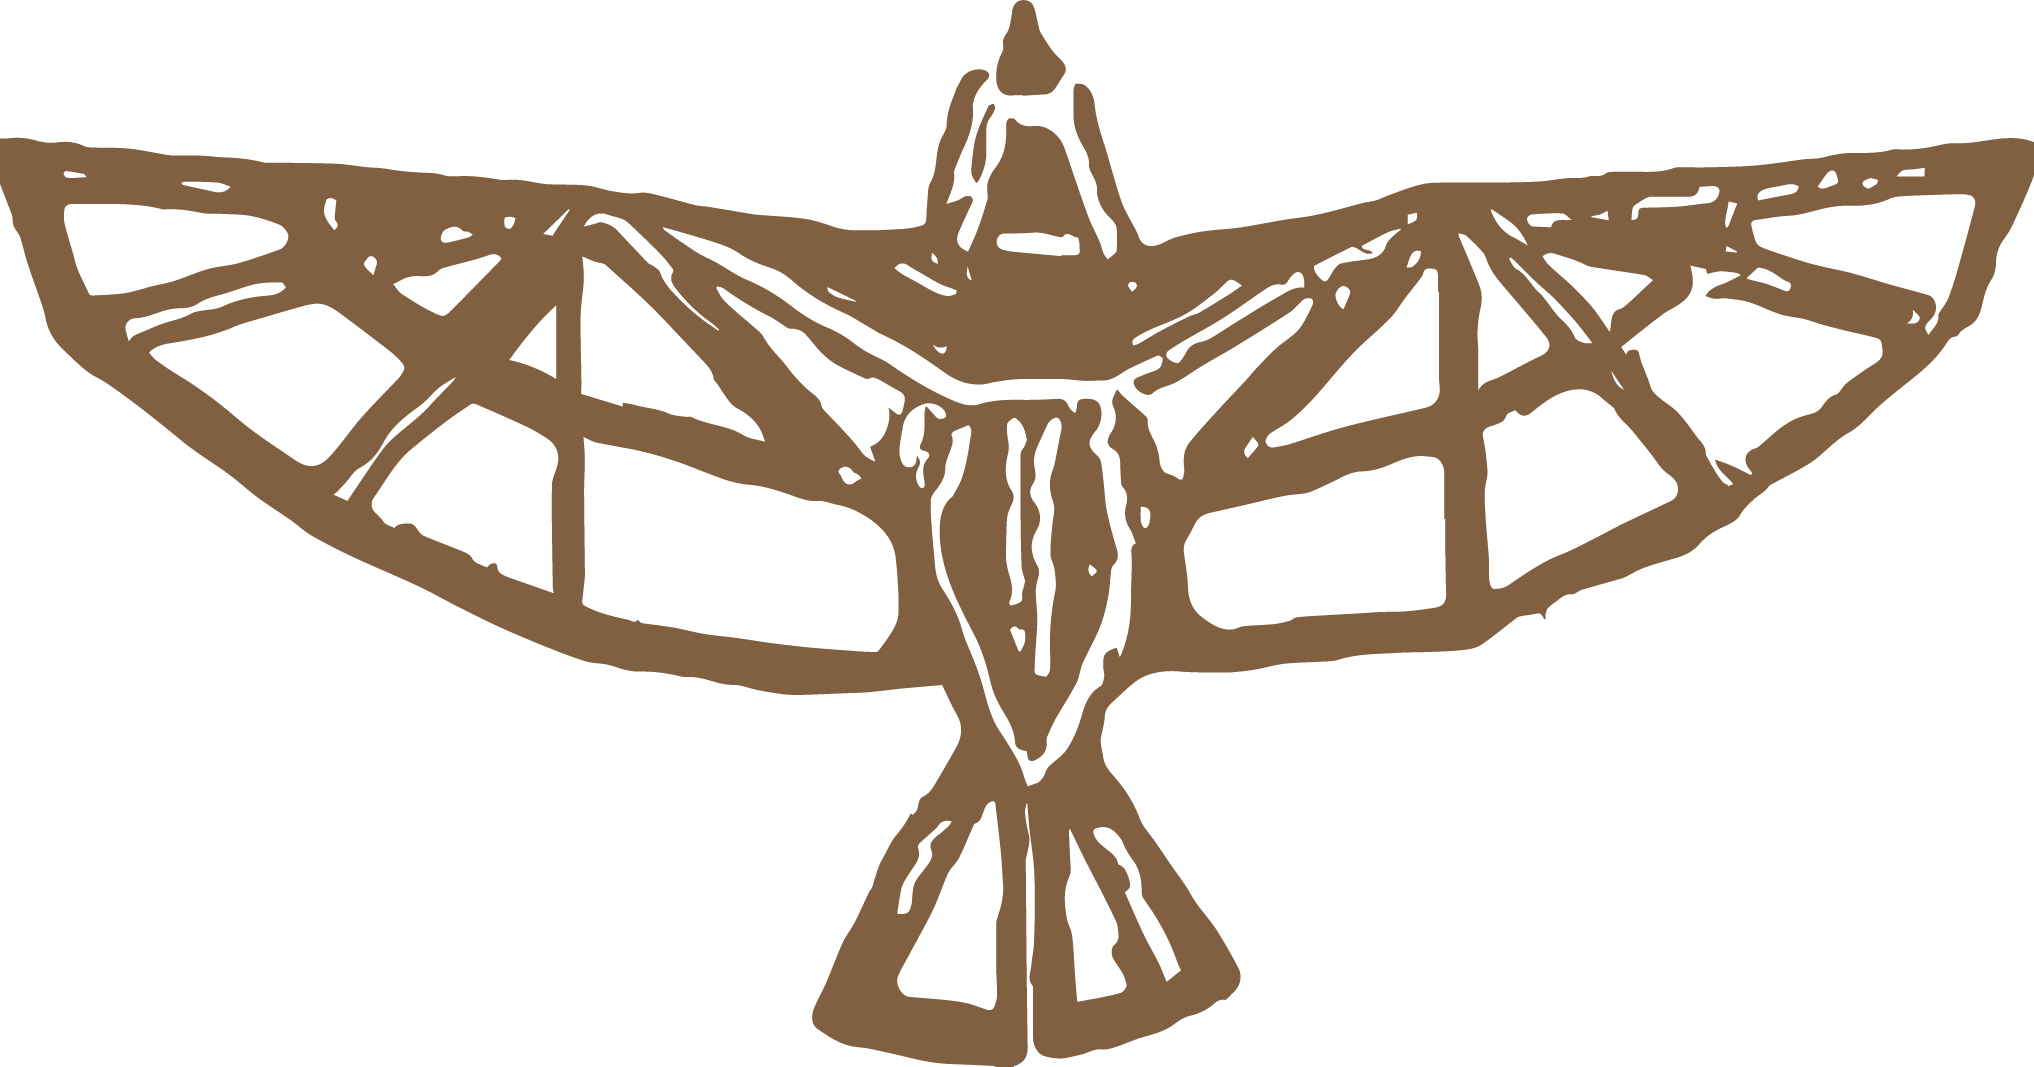 Bronze Age Design